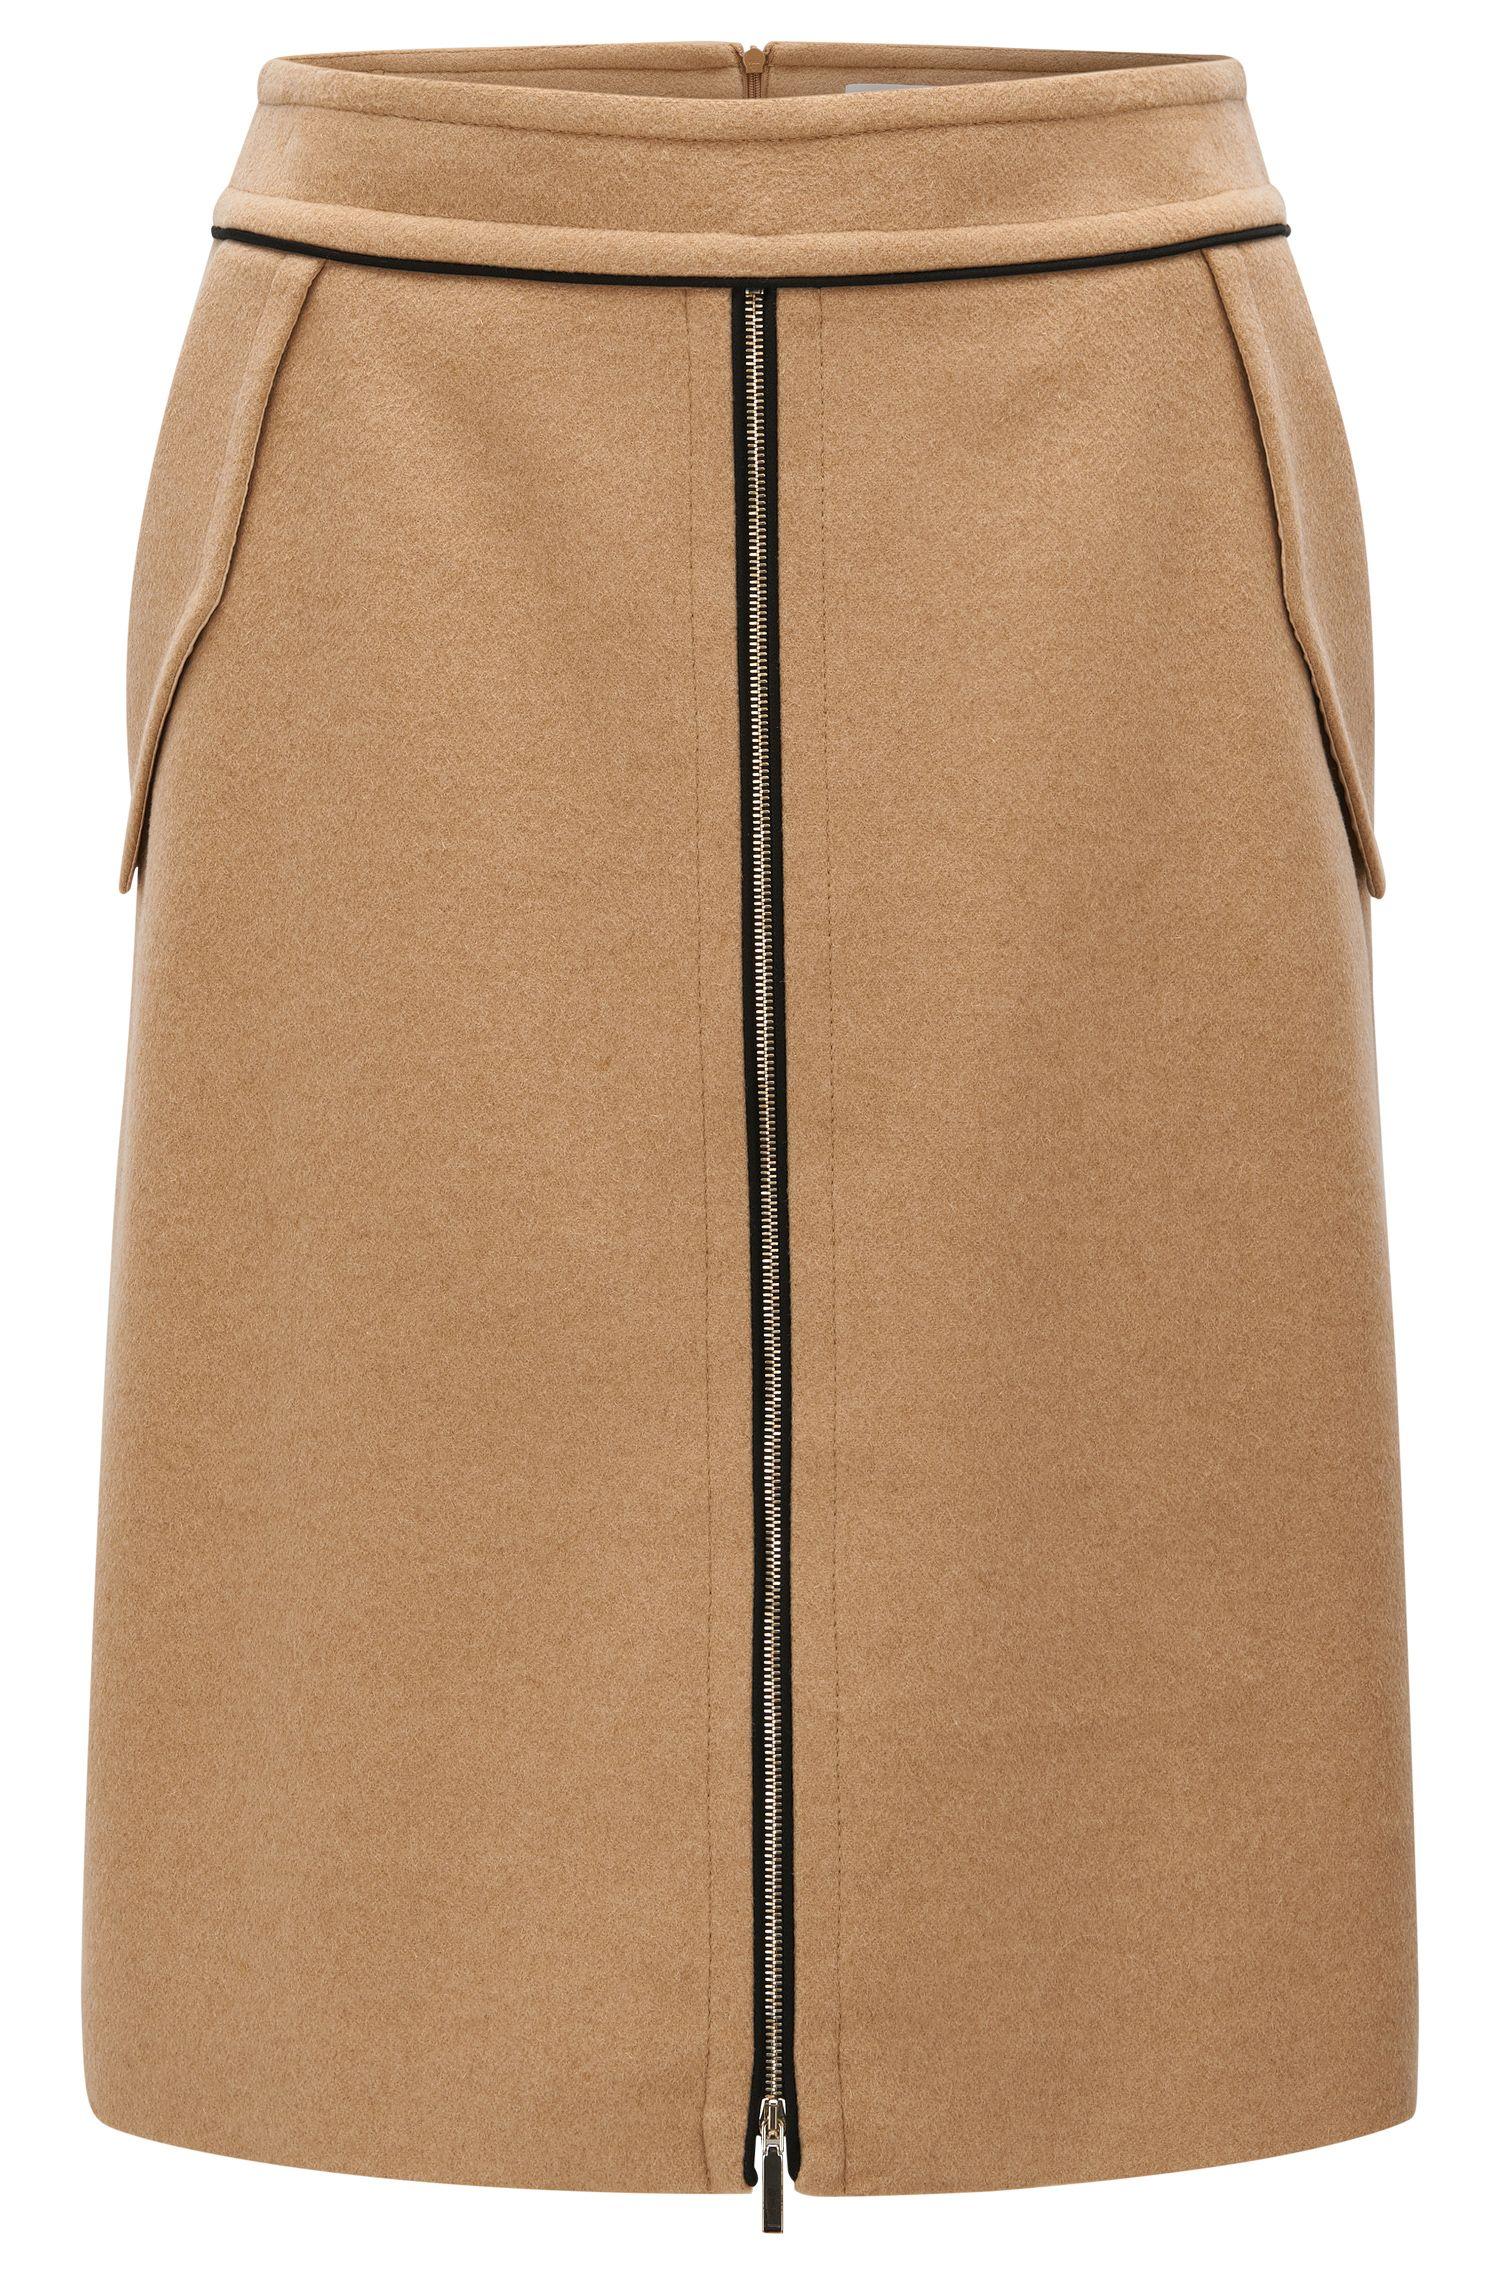 Piped Virgin Wool-Cashmere Skirt | Vumia